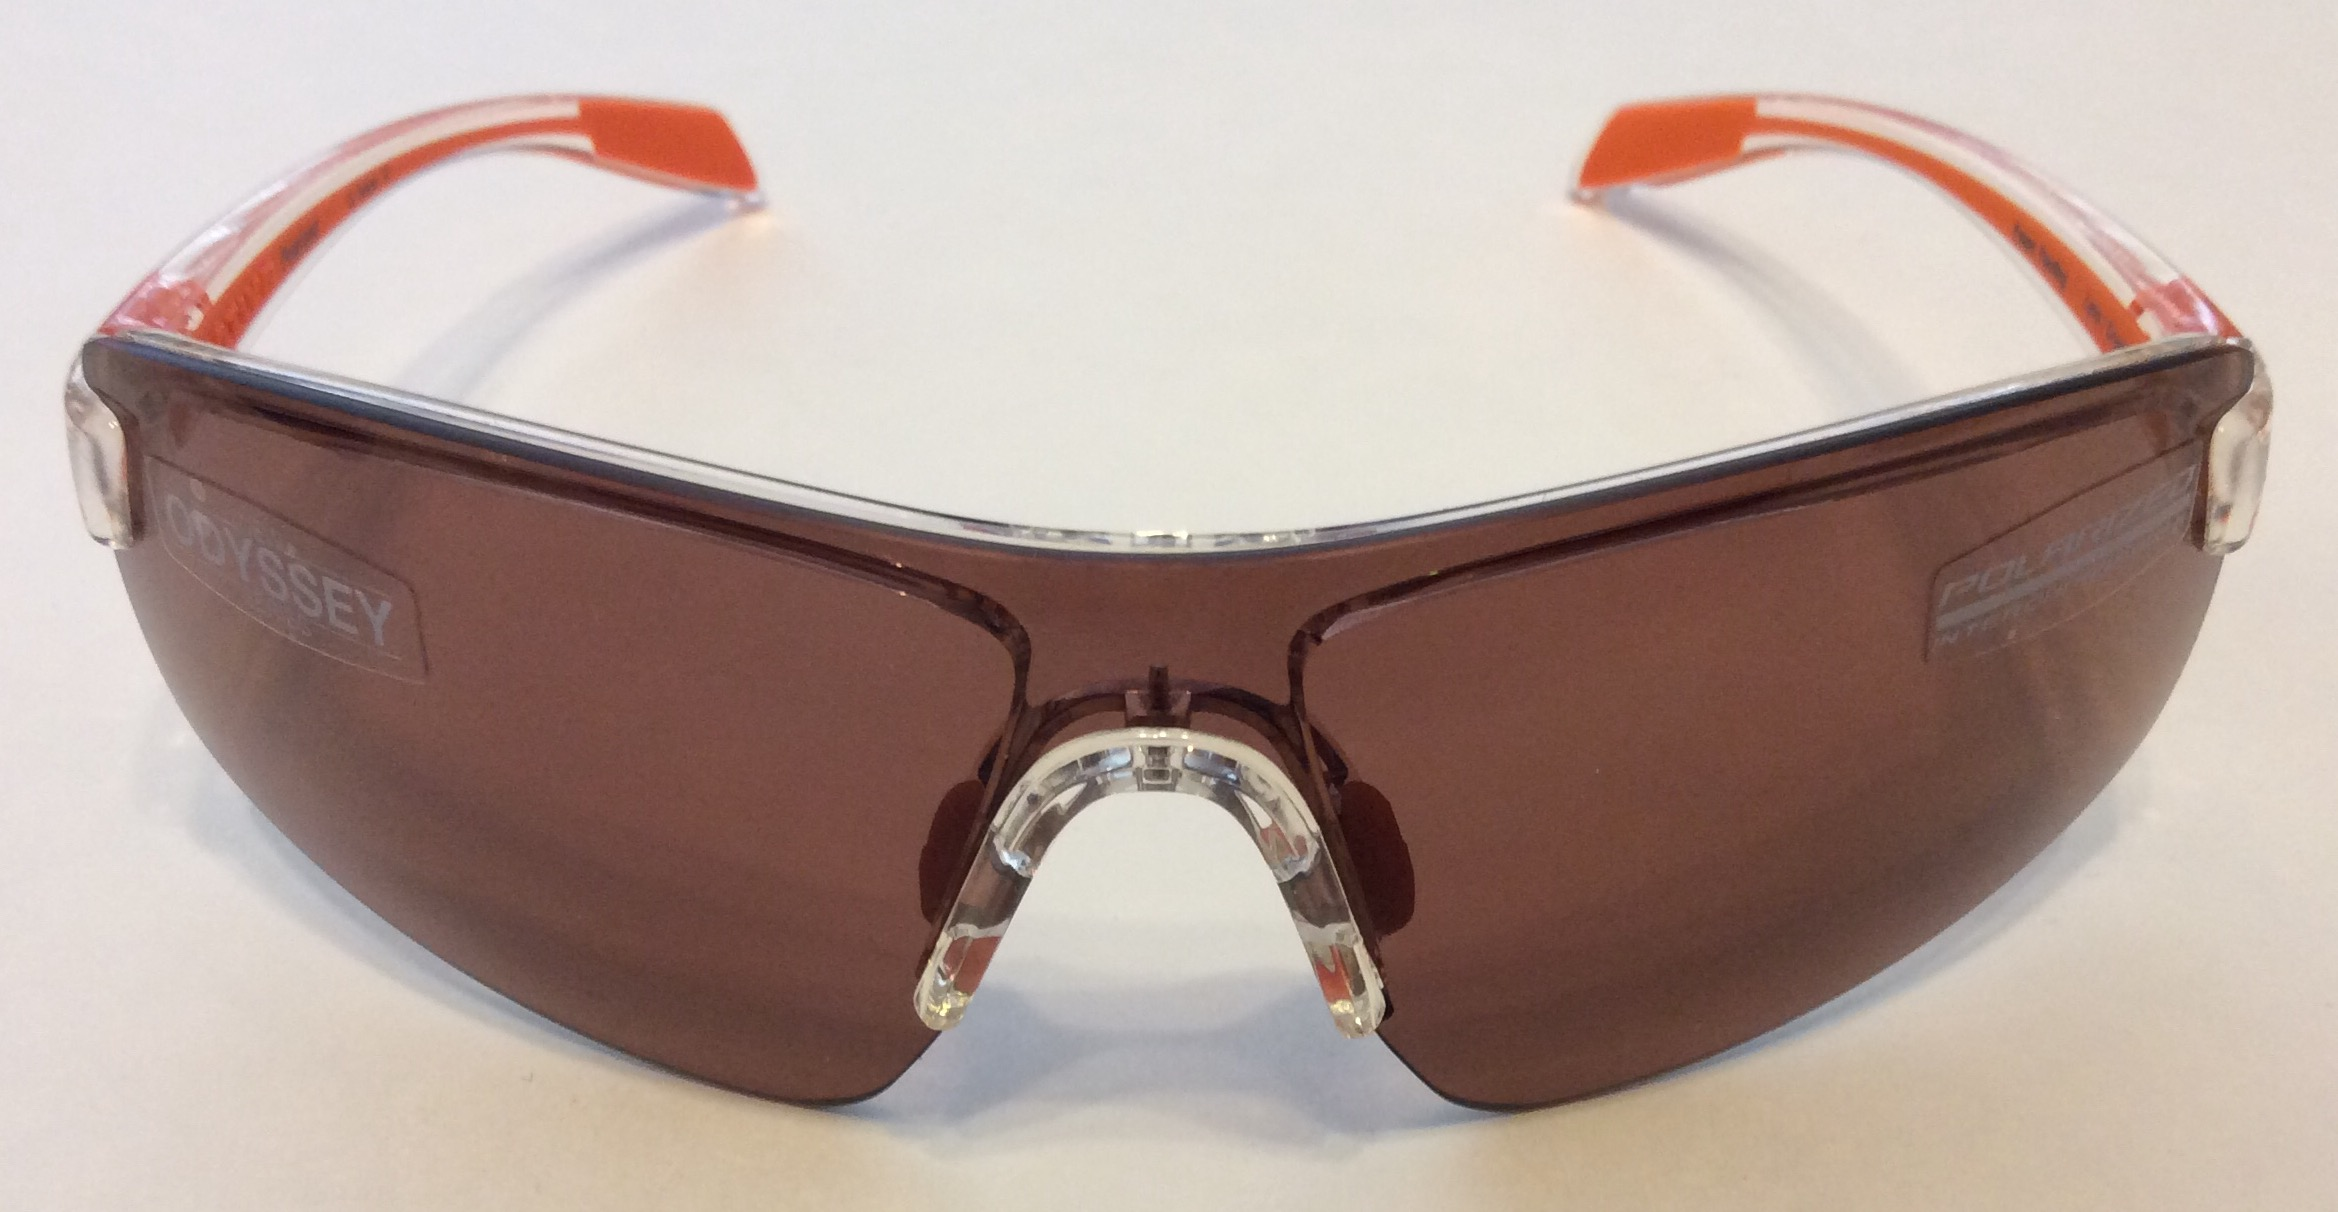 Native Eyewear Lynx Sunglasses Crystal Orange